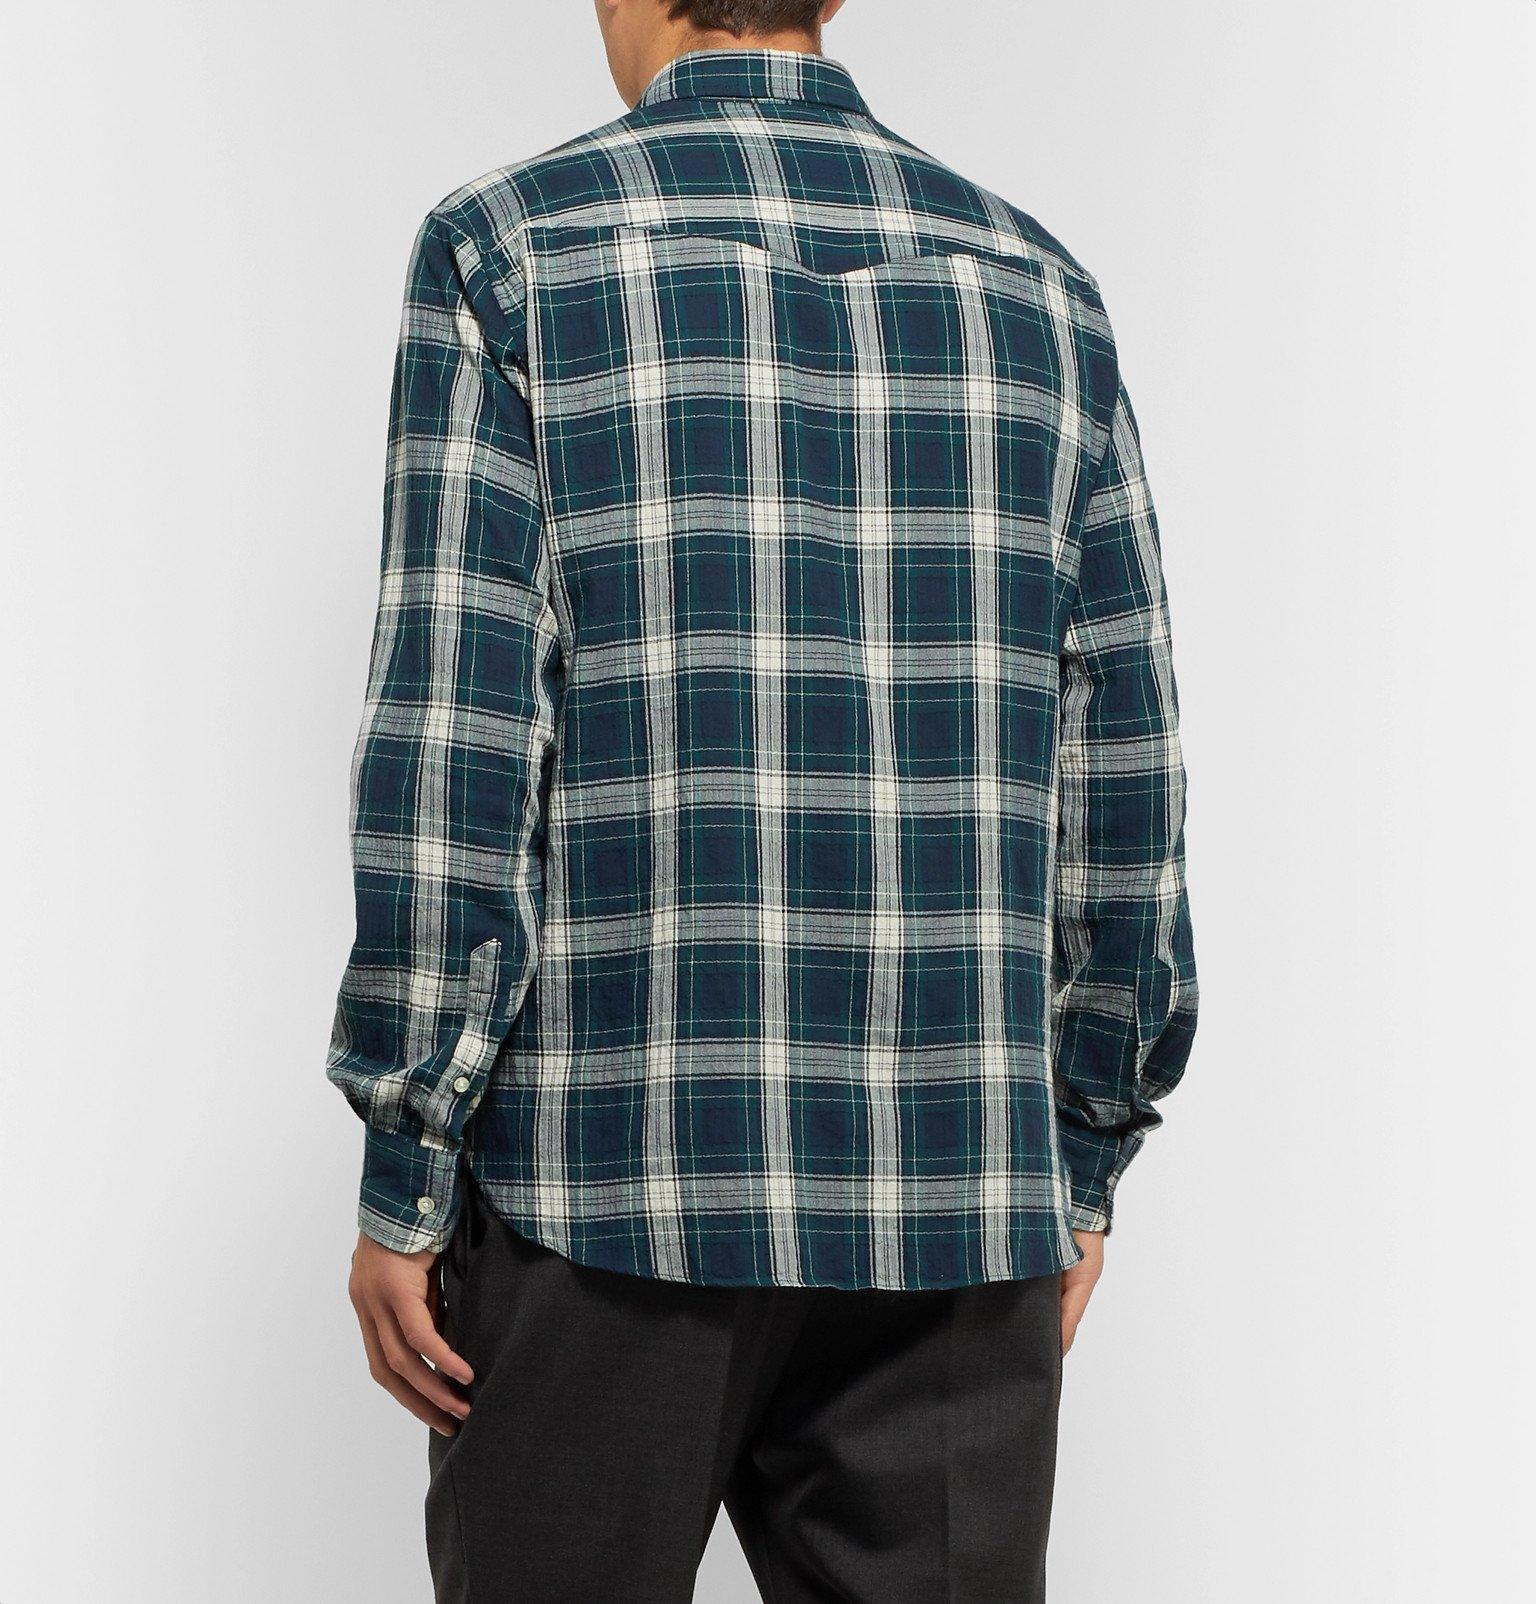 Officine Generale - Button-Down Collar Checked Cotton Shirt - Green